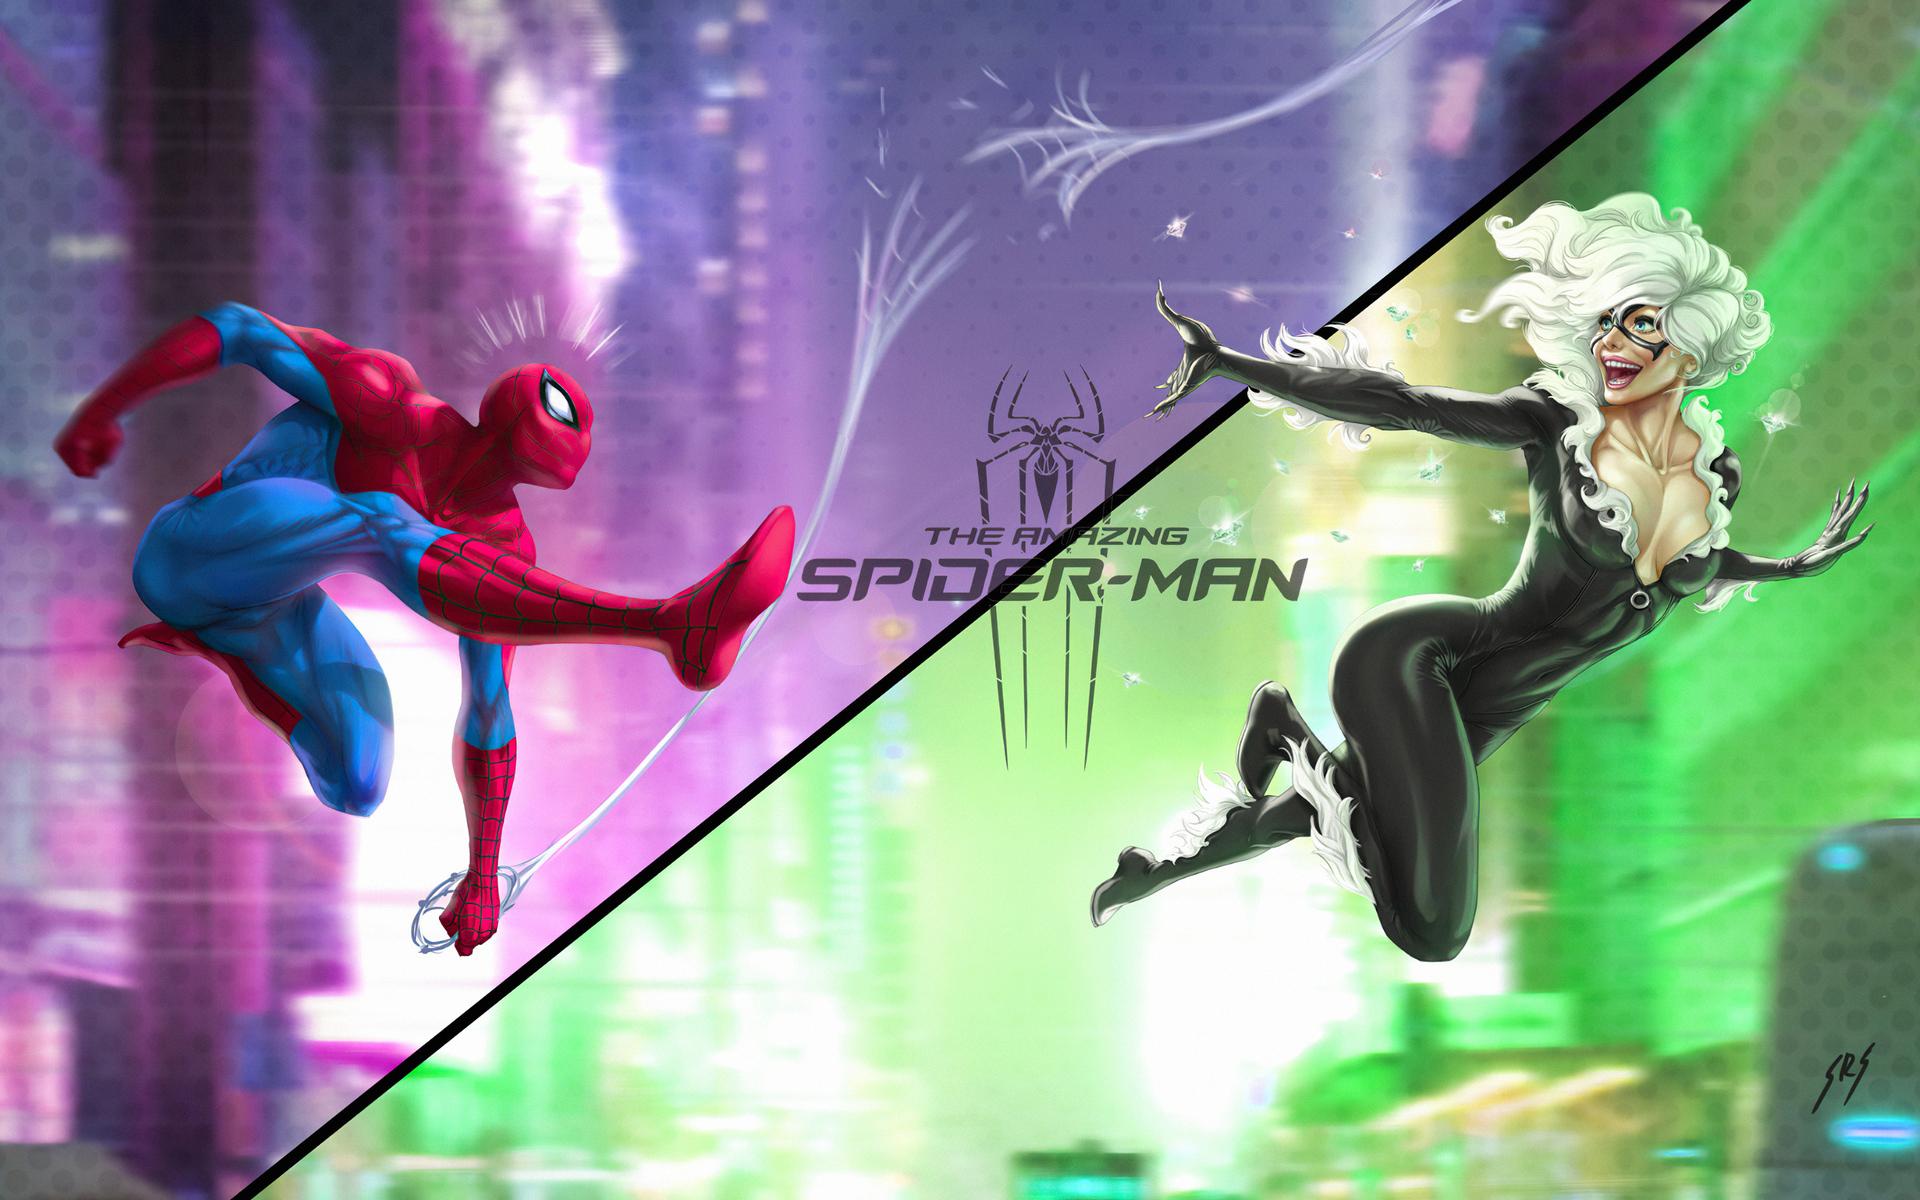 spiderman-and-black-cat-h7.jpg